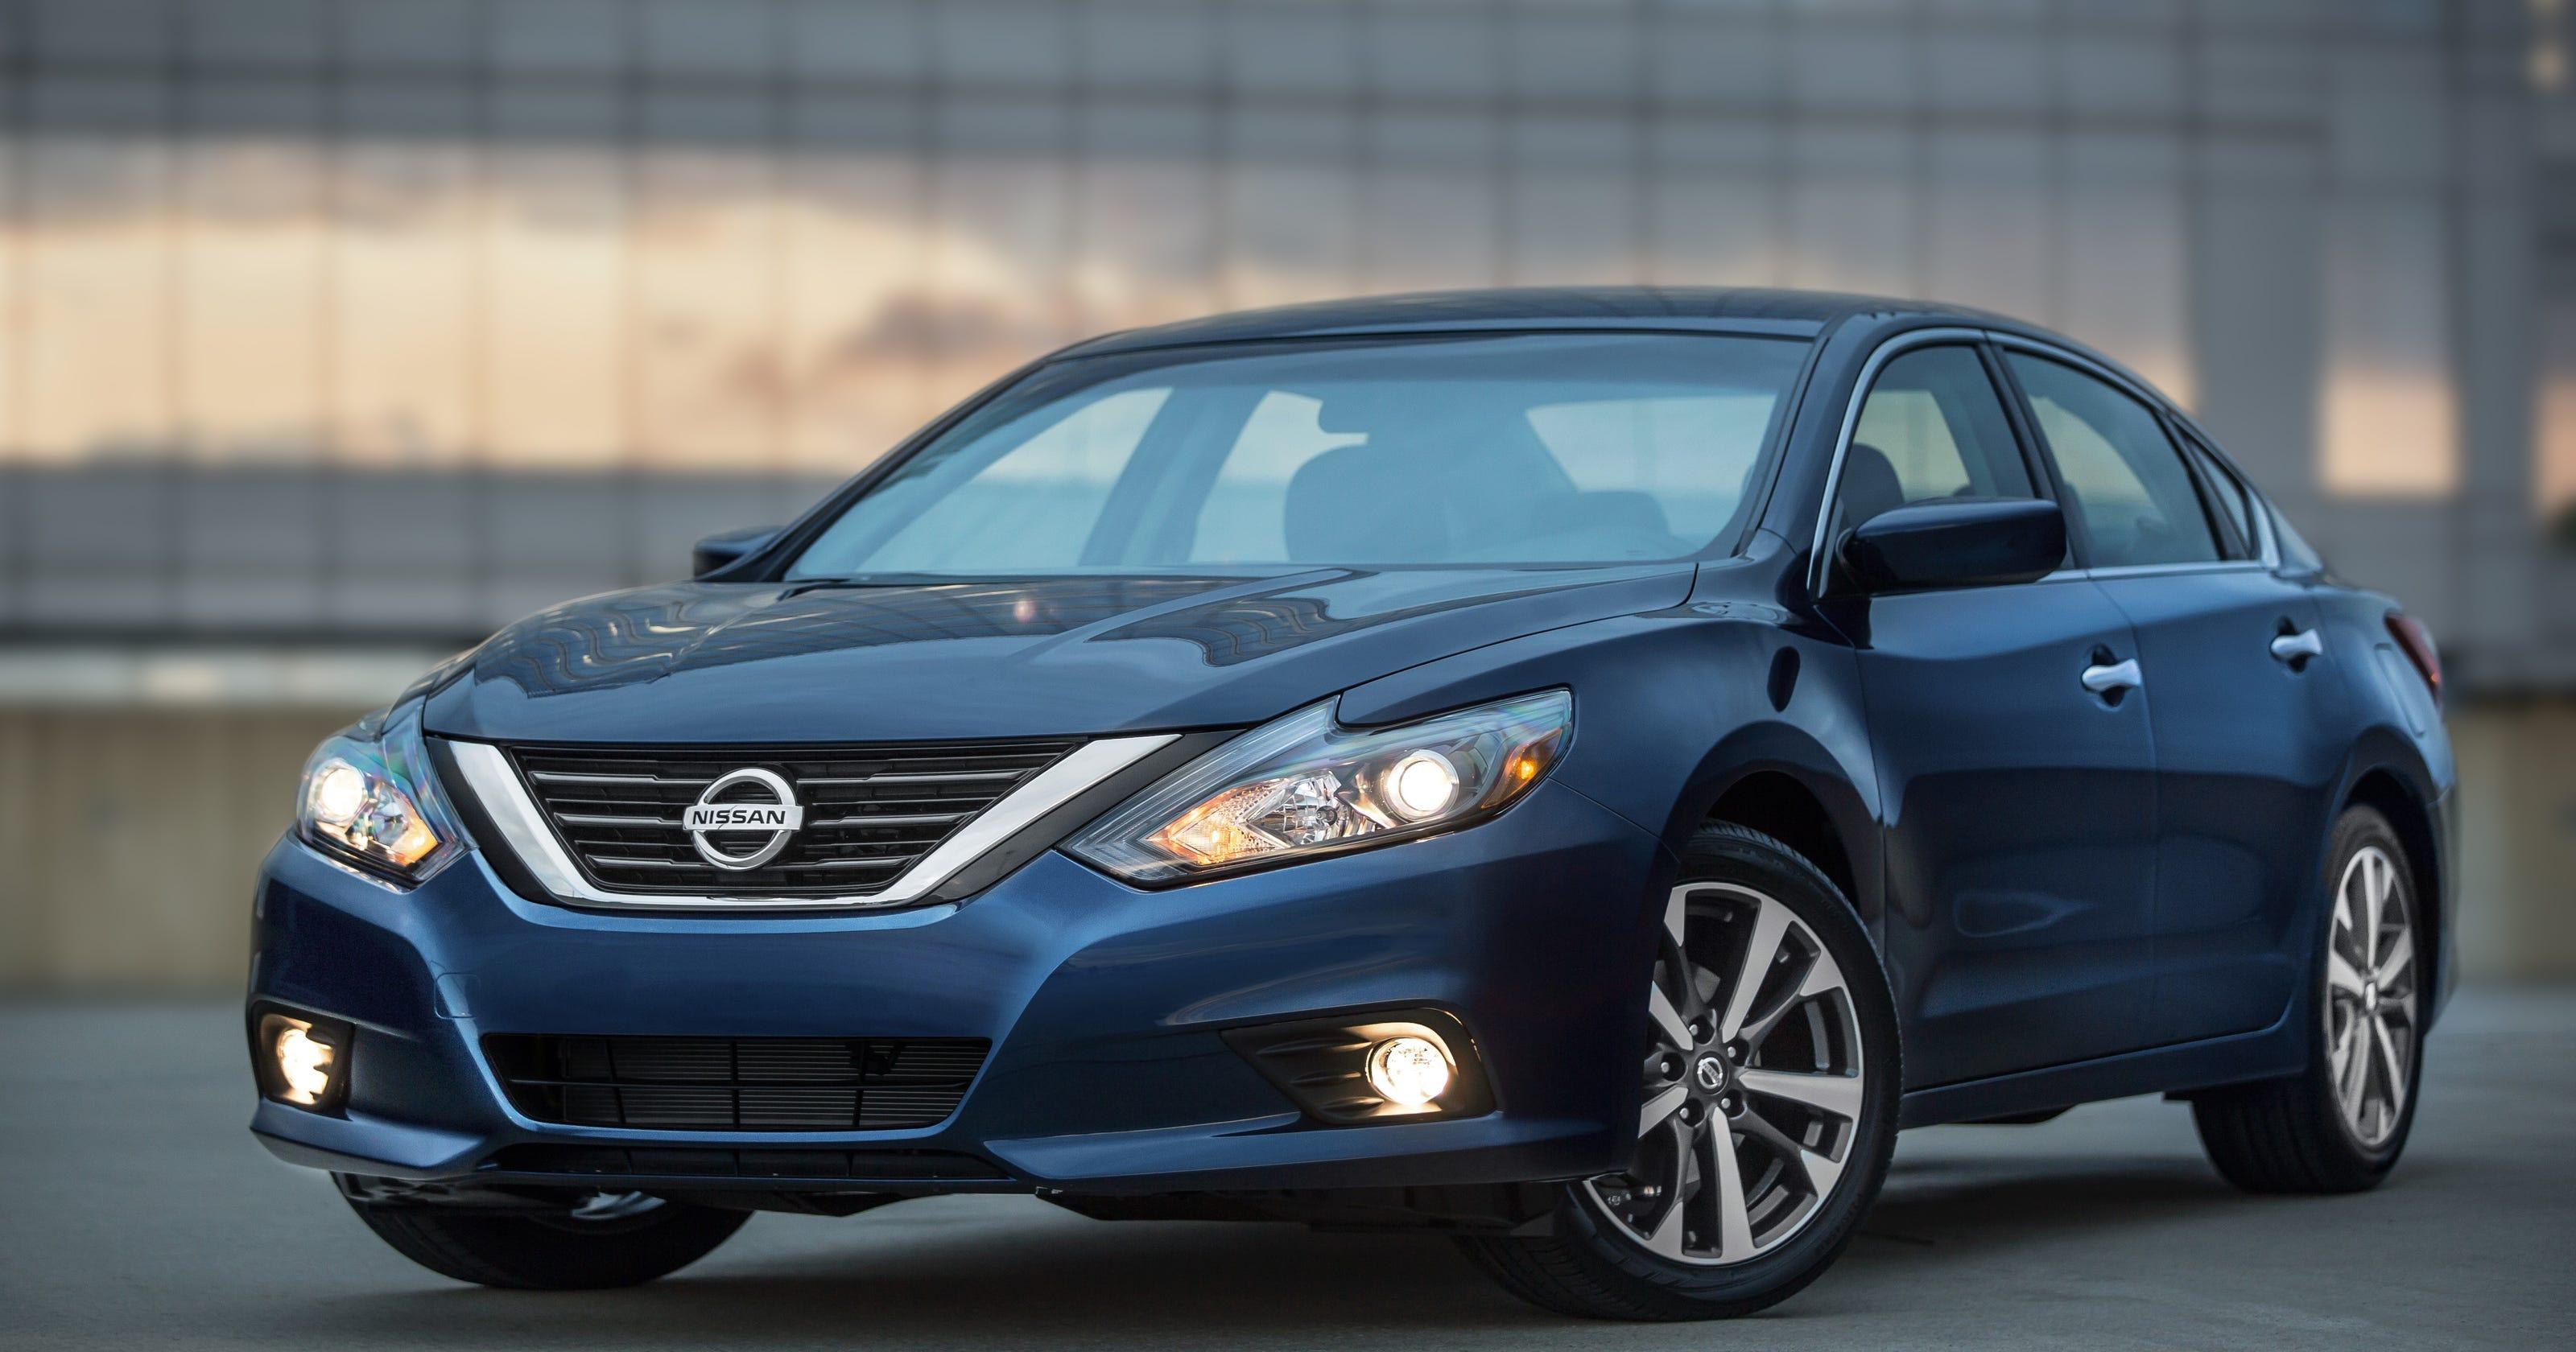 Nissan Prices 2016 Altima Midsize Sedan At 22 500